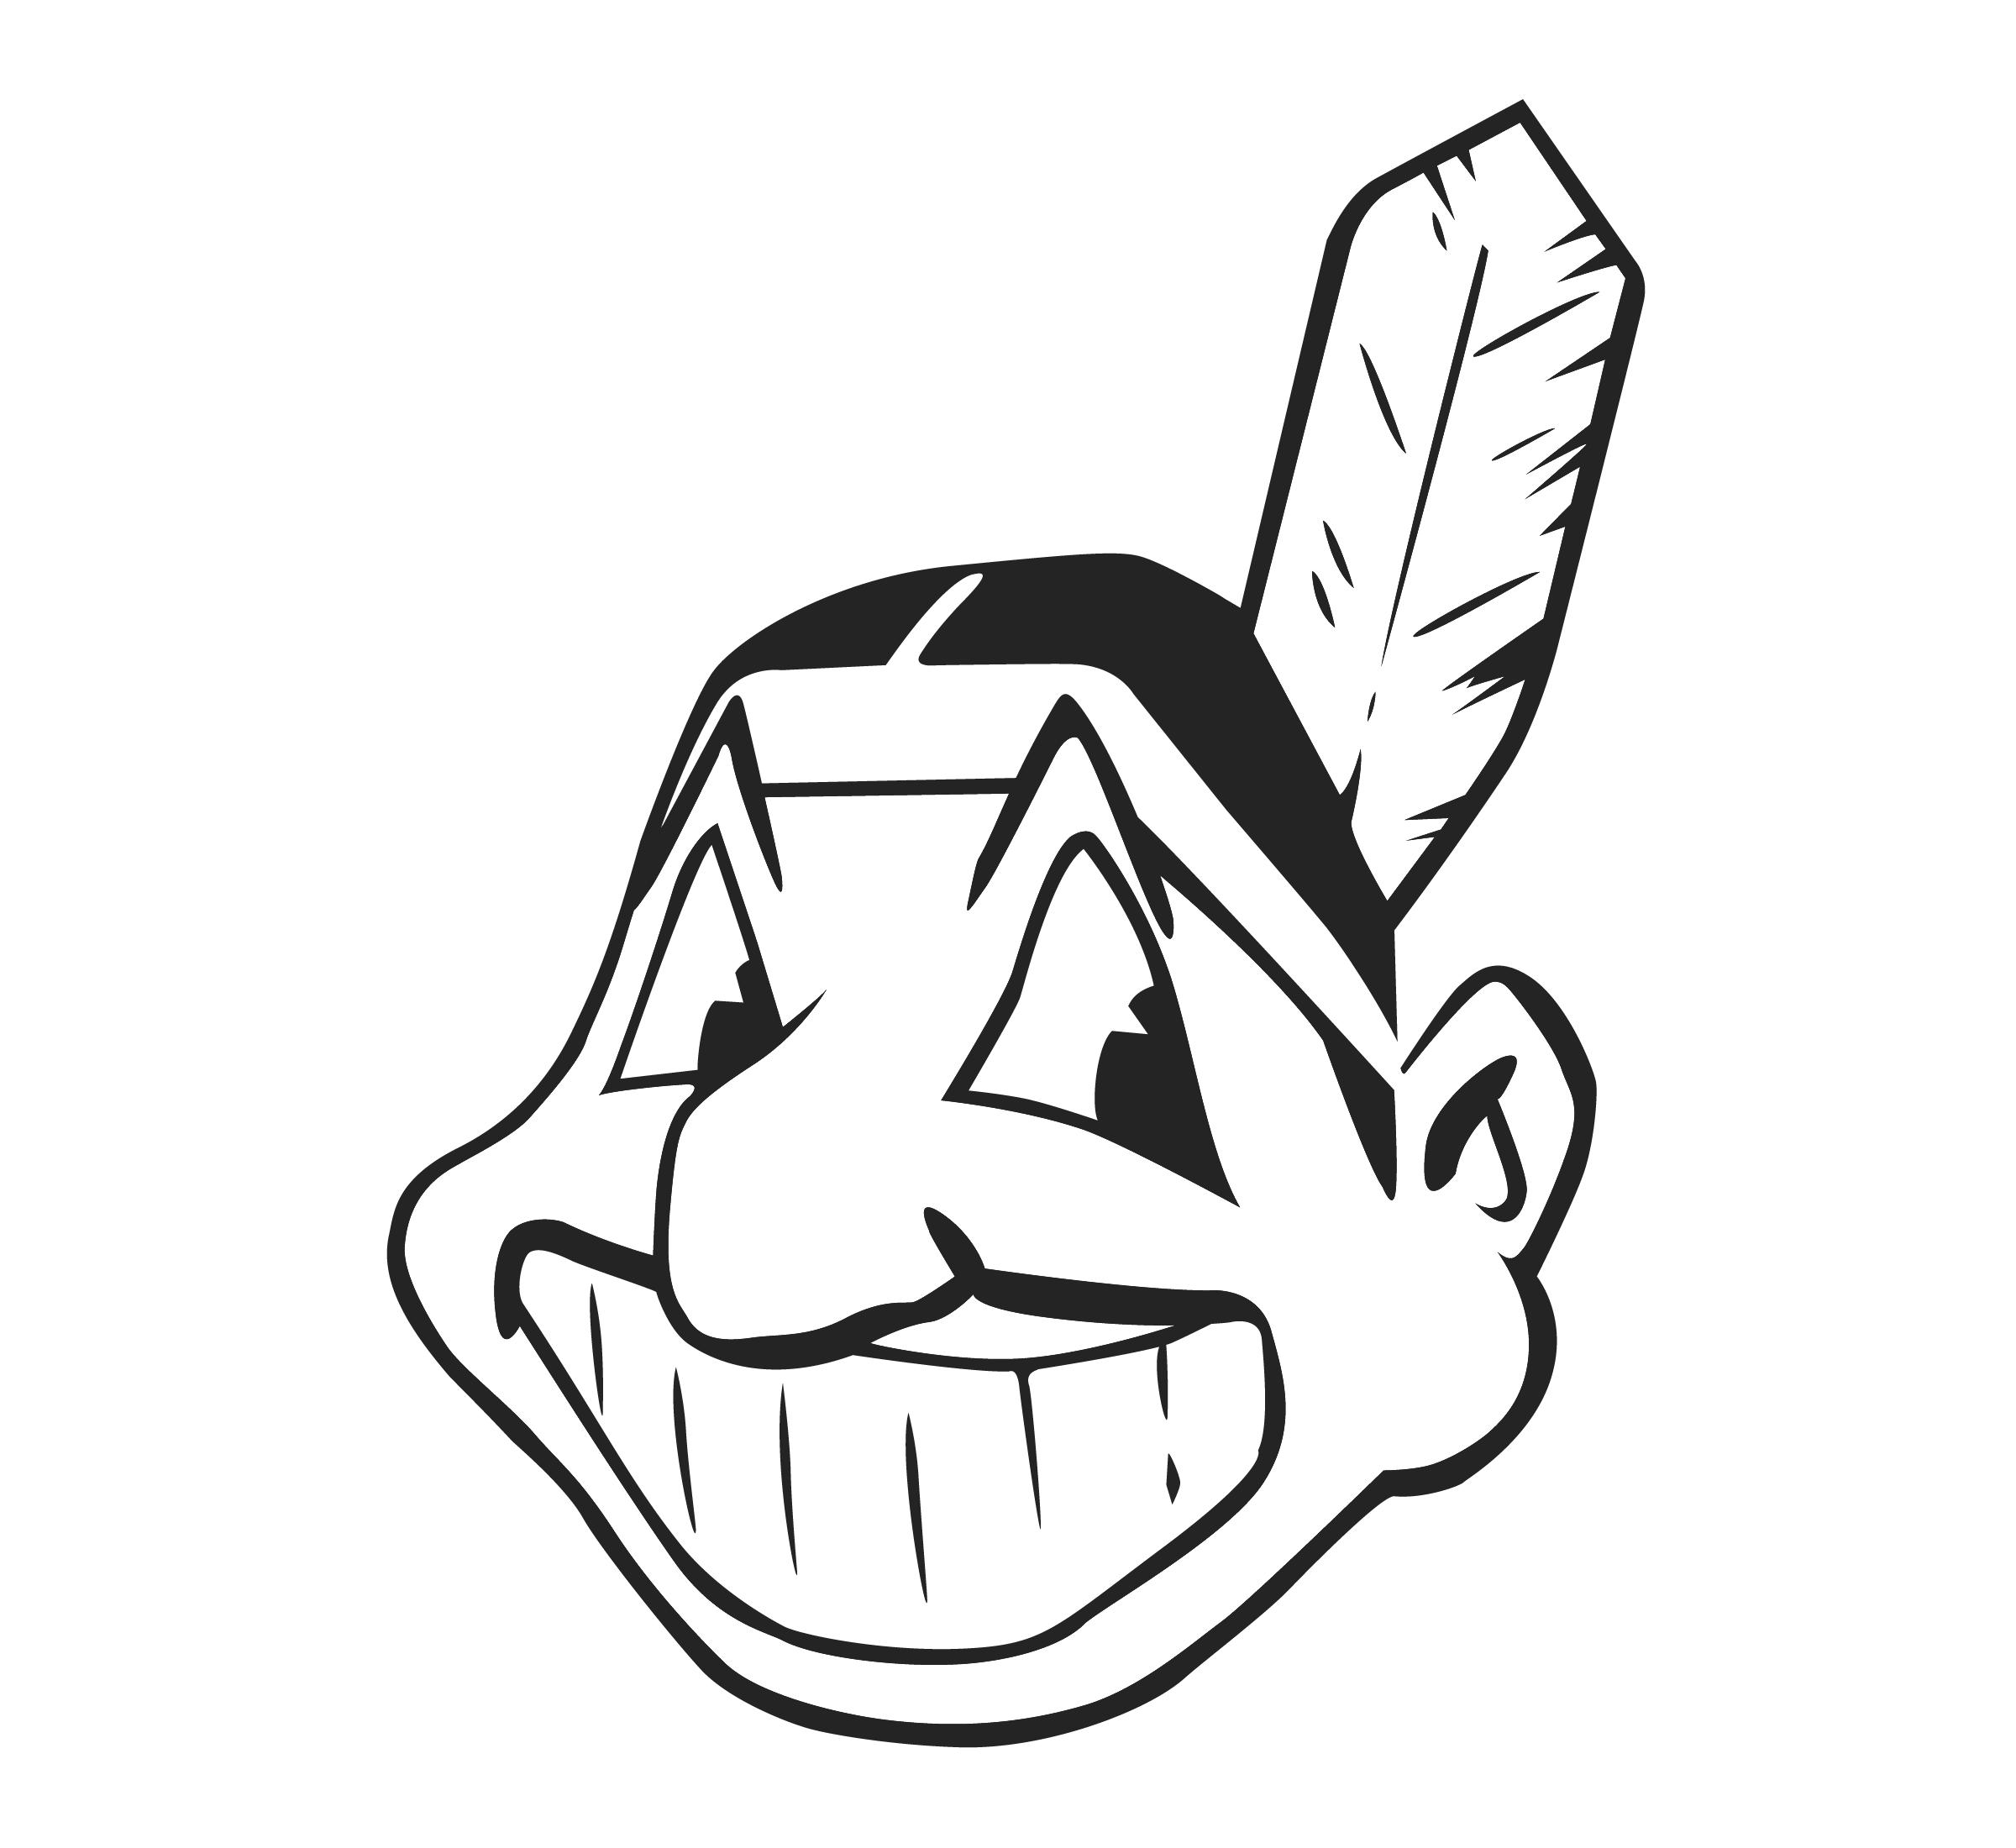 American Indians PNG Image Cleveland indians logo